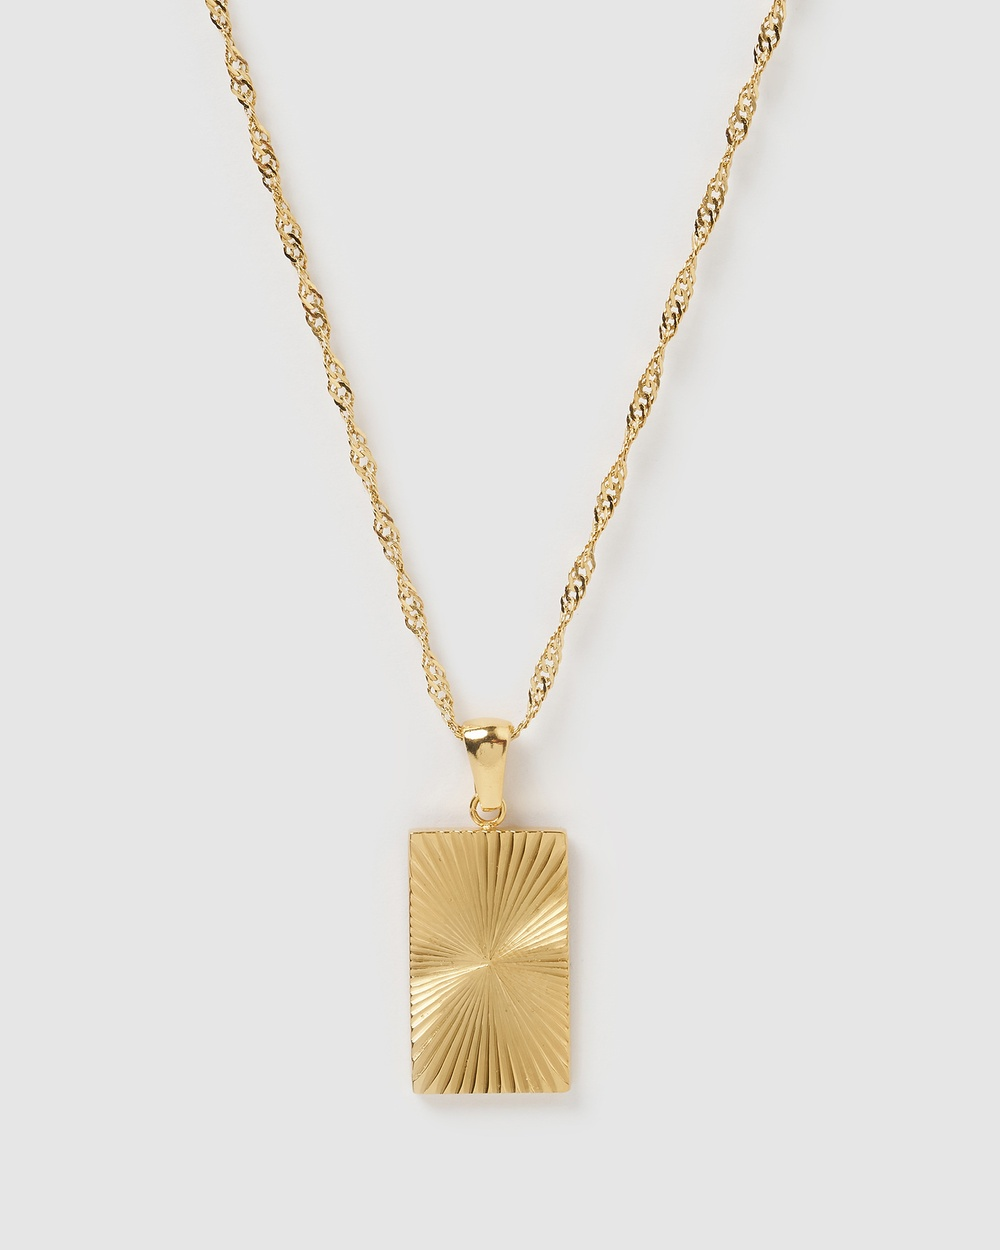 Miz Casa and Co Dina Pendant Necklace Jewellery Gold